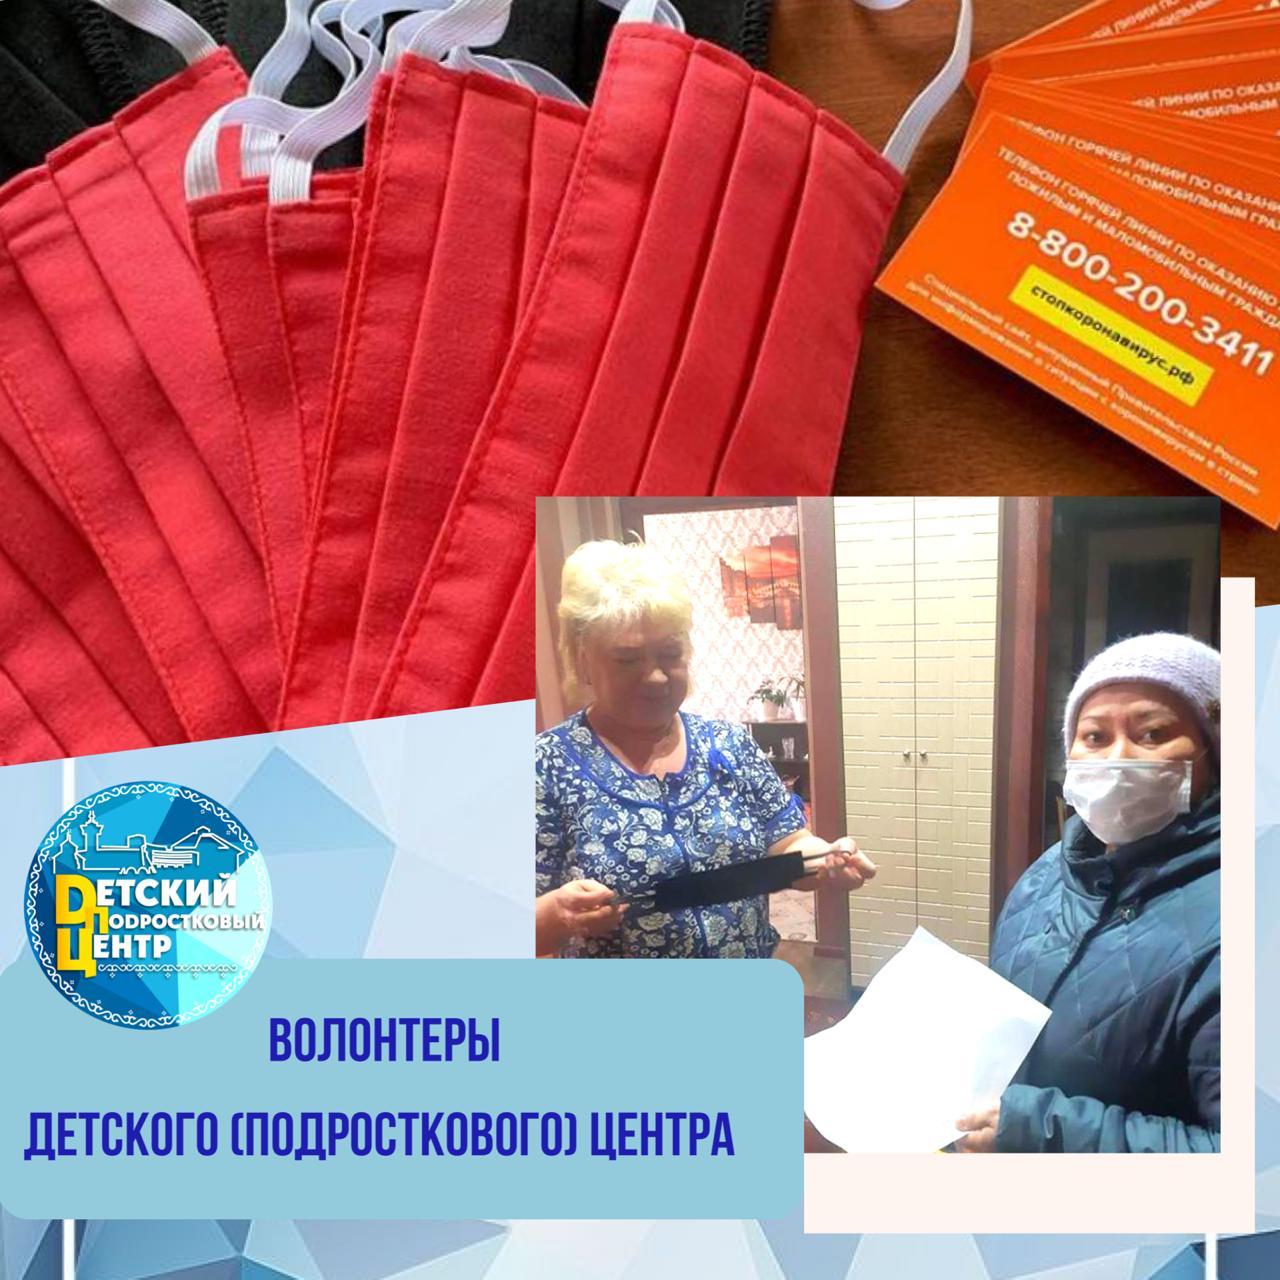 Сотрудники Детского  Центра города Якутска работают волонтерами